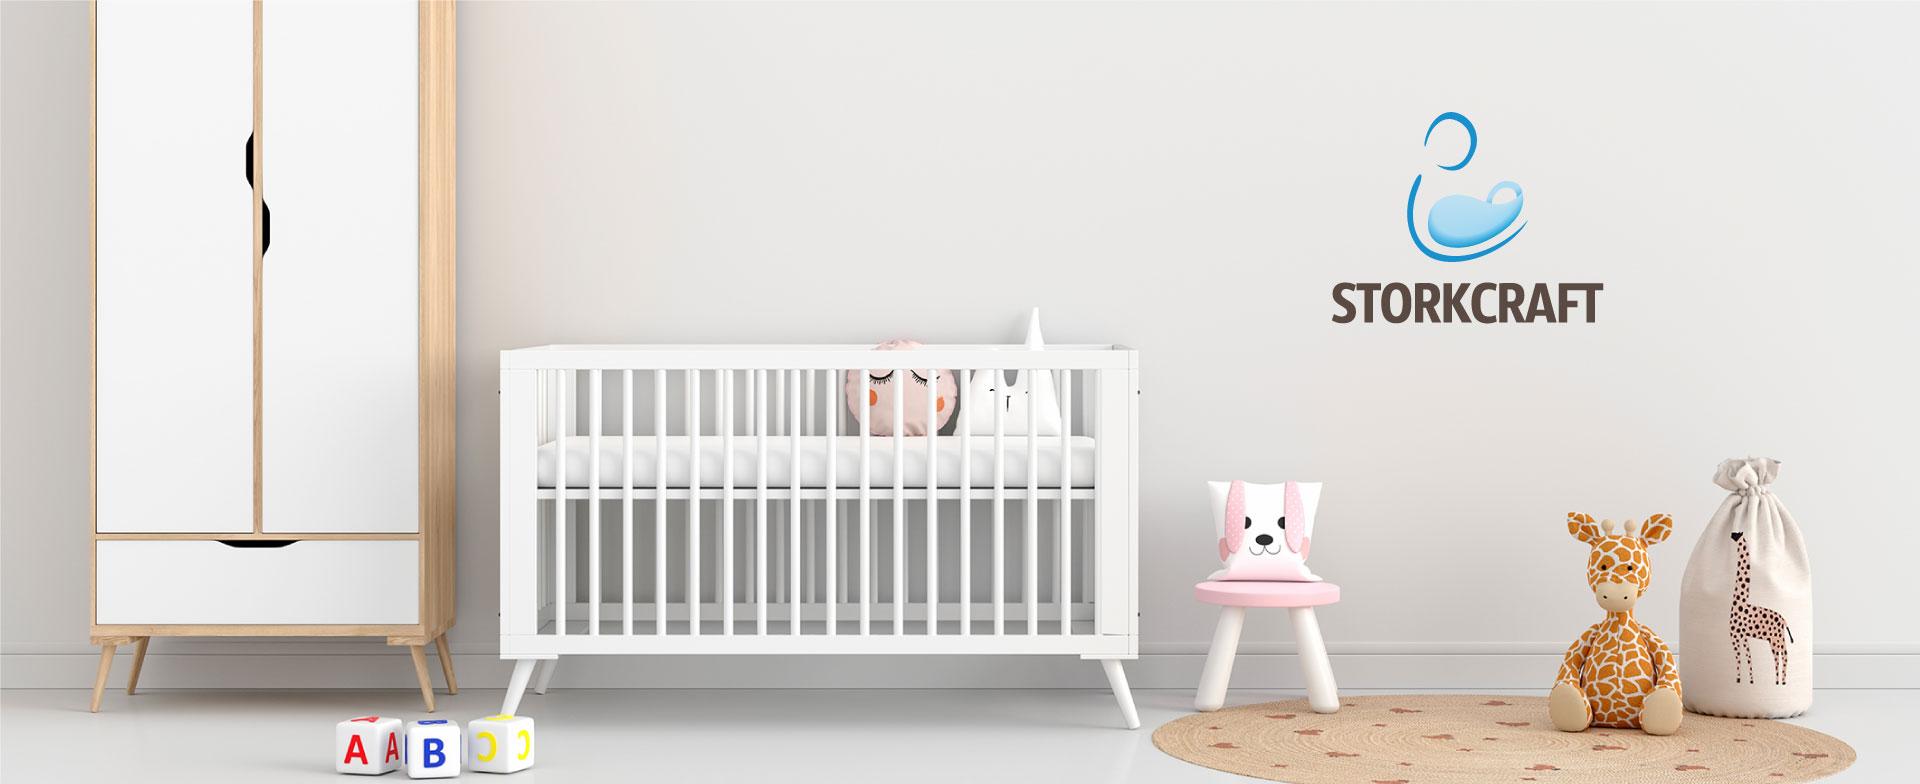 storkcraft-brand-logo-design-by-mapleweb-vancouver-canada-decor-kids-room-furniture-mock